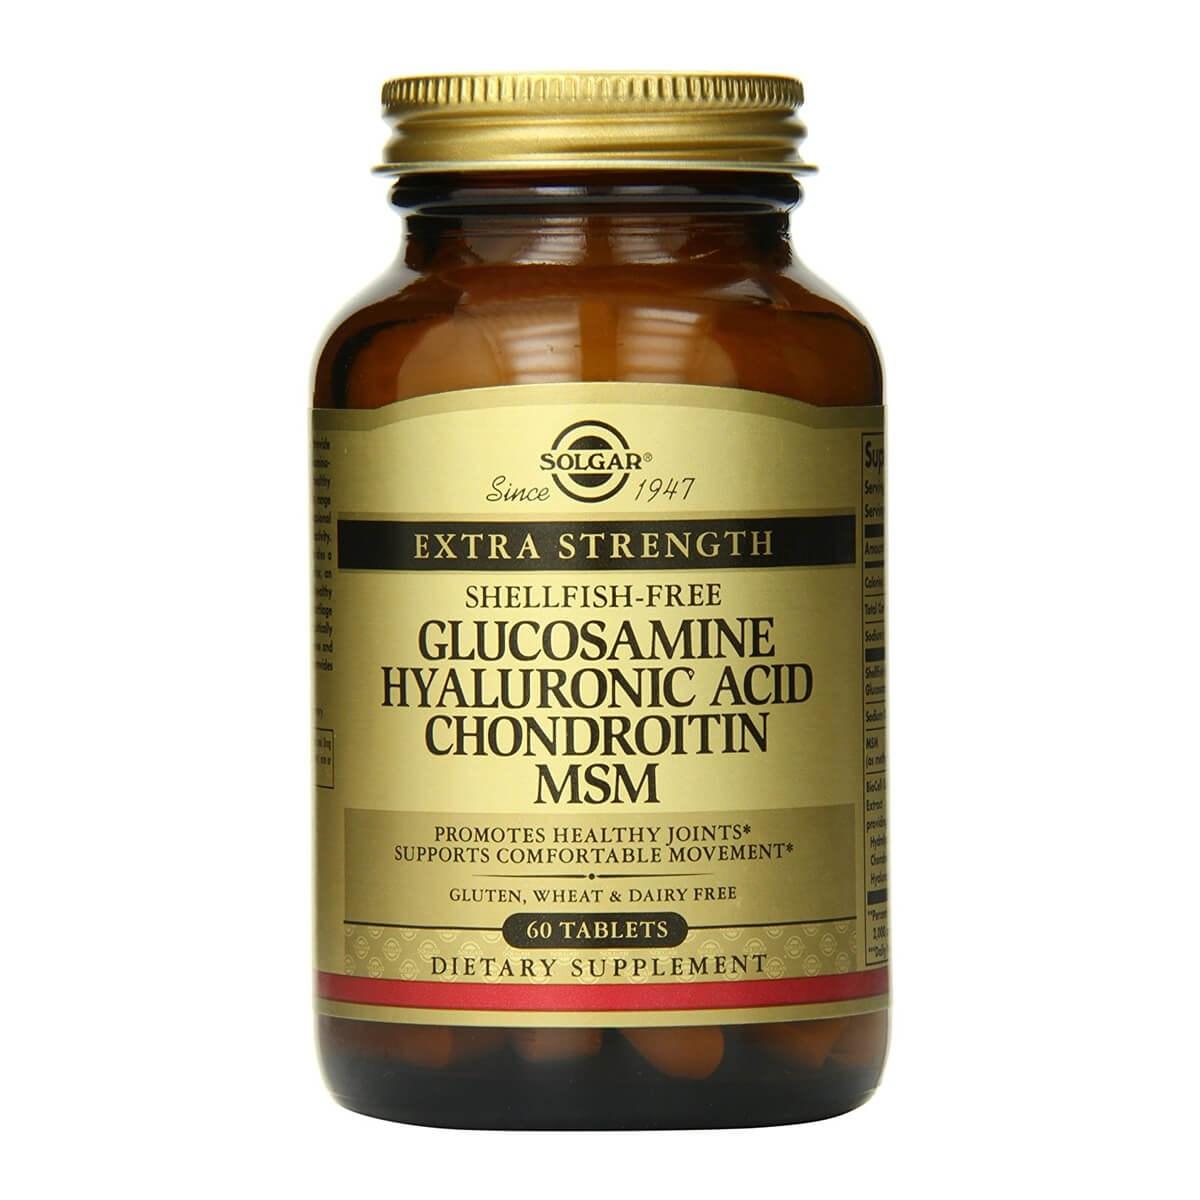 Solgar Extra Strength Glucosamine Chondroitin MSM Tablets - (Shellfish-Free)